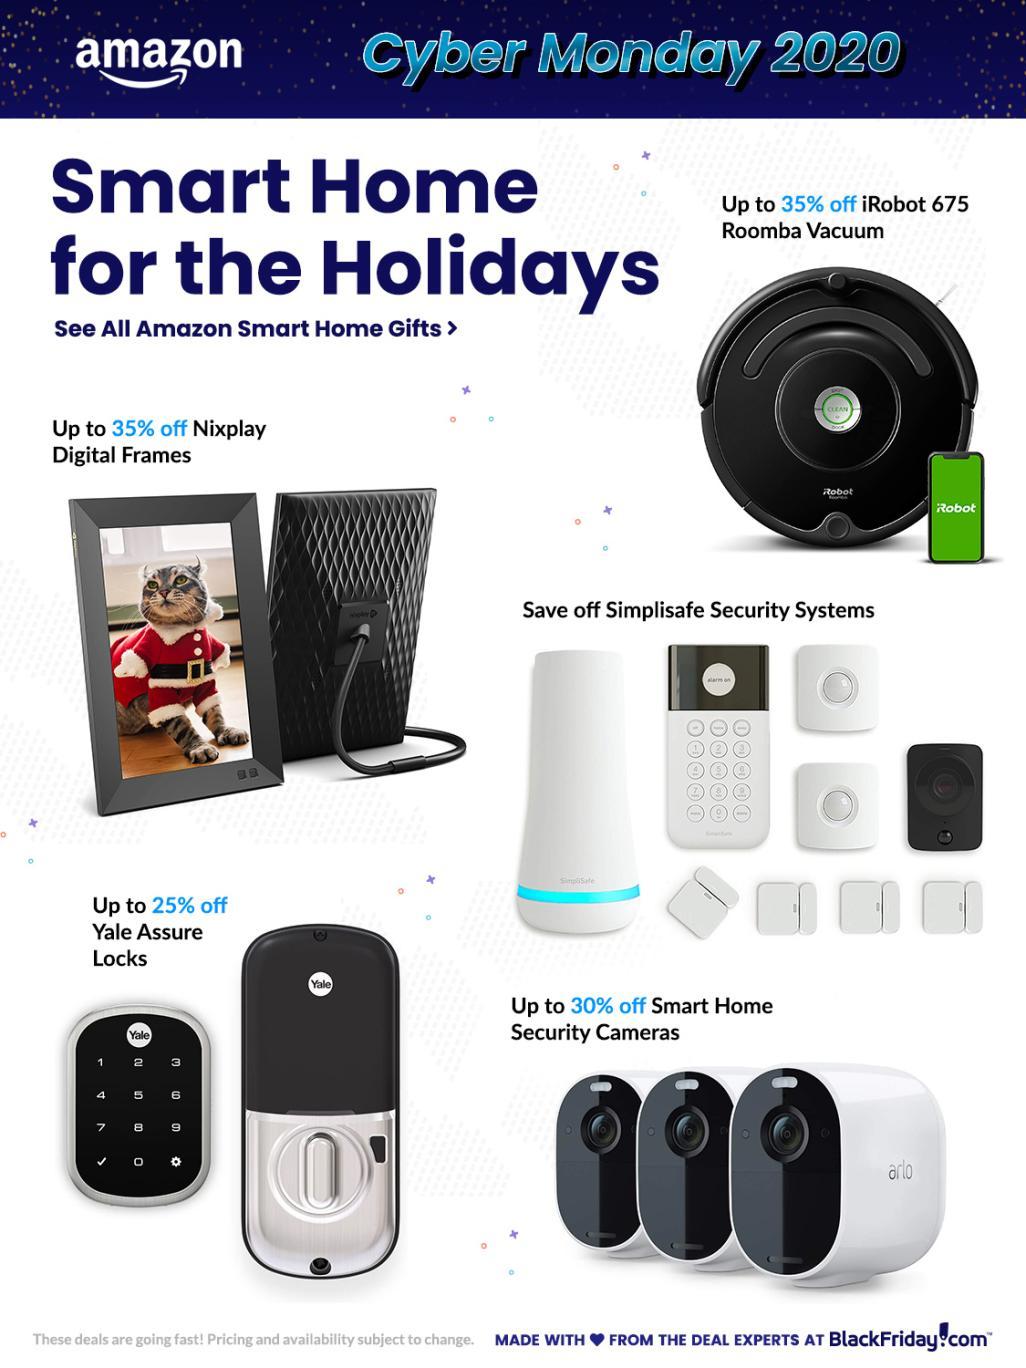 Amazon CyberMonday 2020 Ad